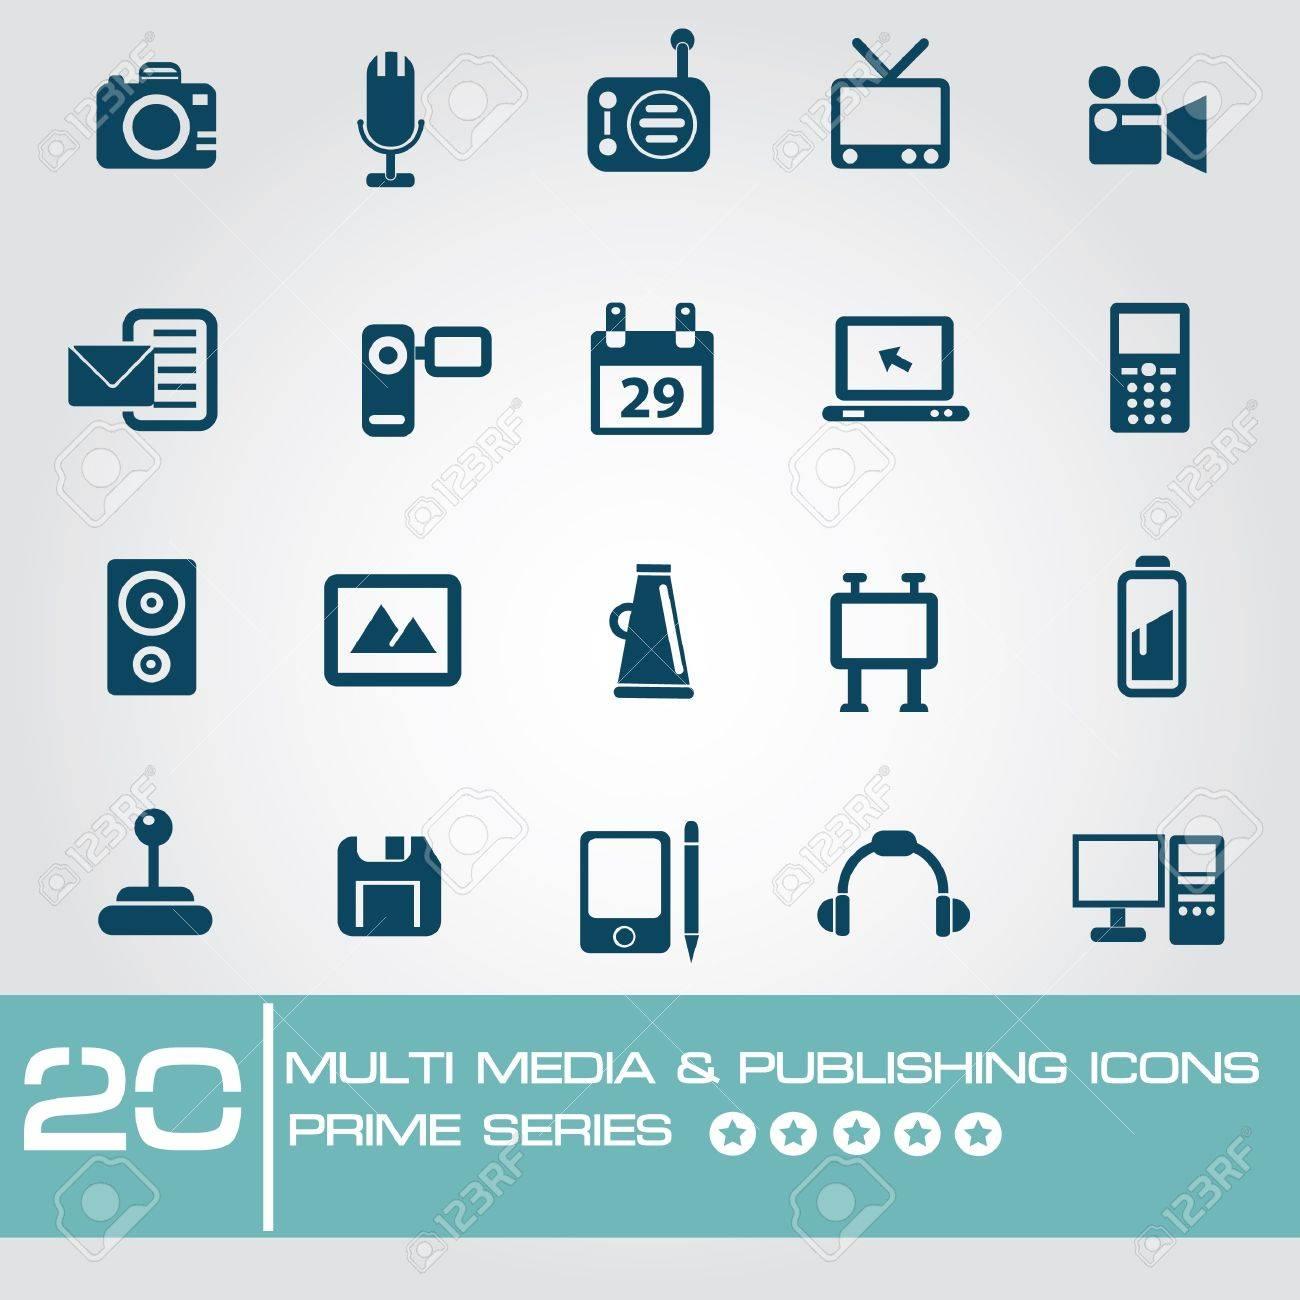 Multi media   Publishing icons,Prime series Stock Vector - 19770745